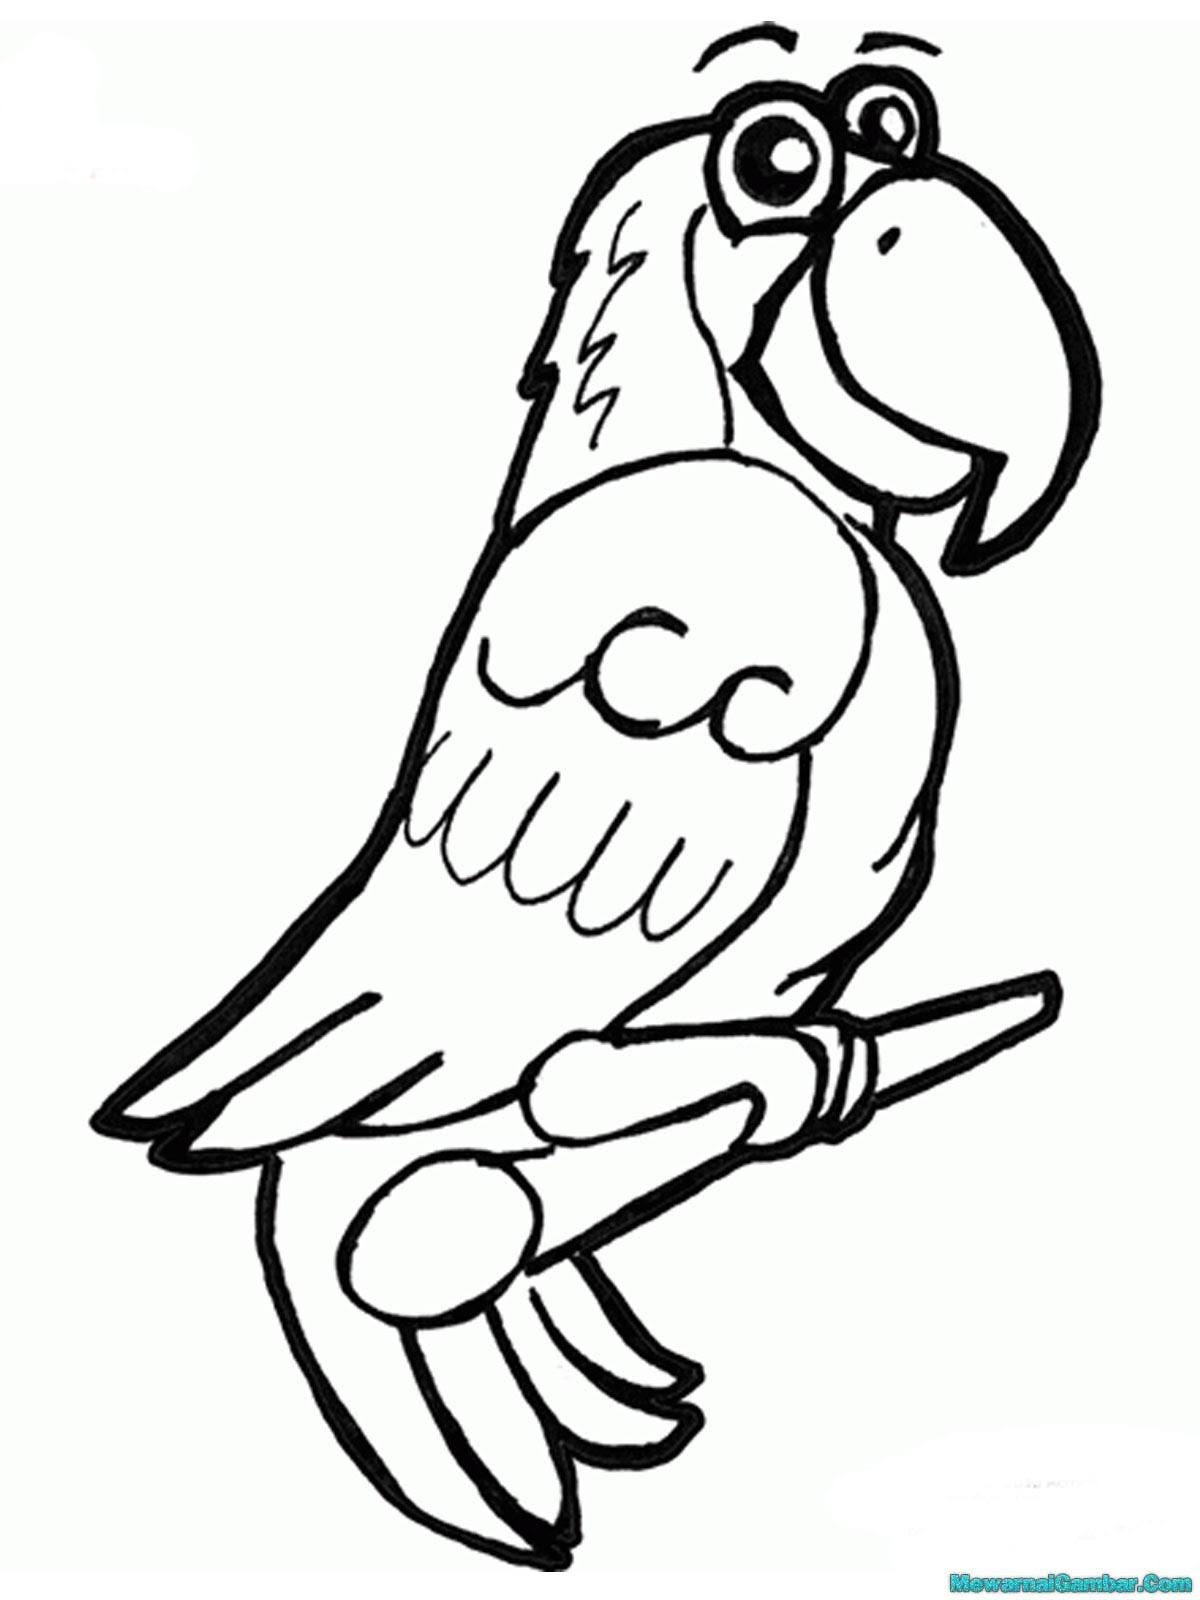 Mewarnai Gambar Burung Merpati Auto Electrical Wiring Diagram